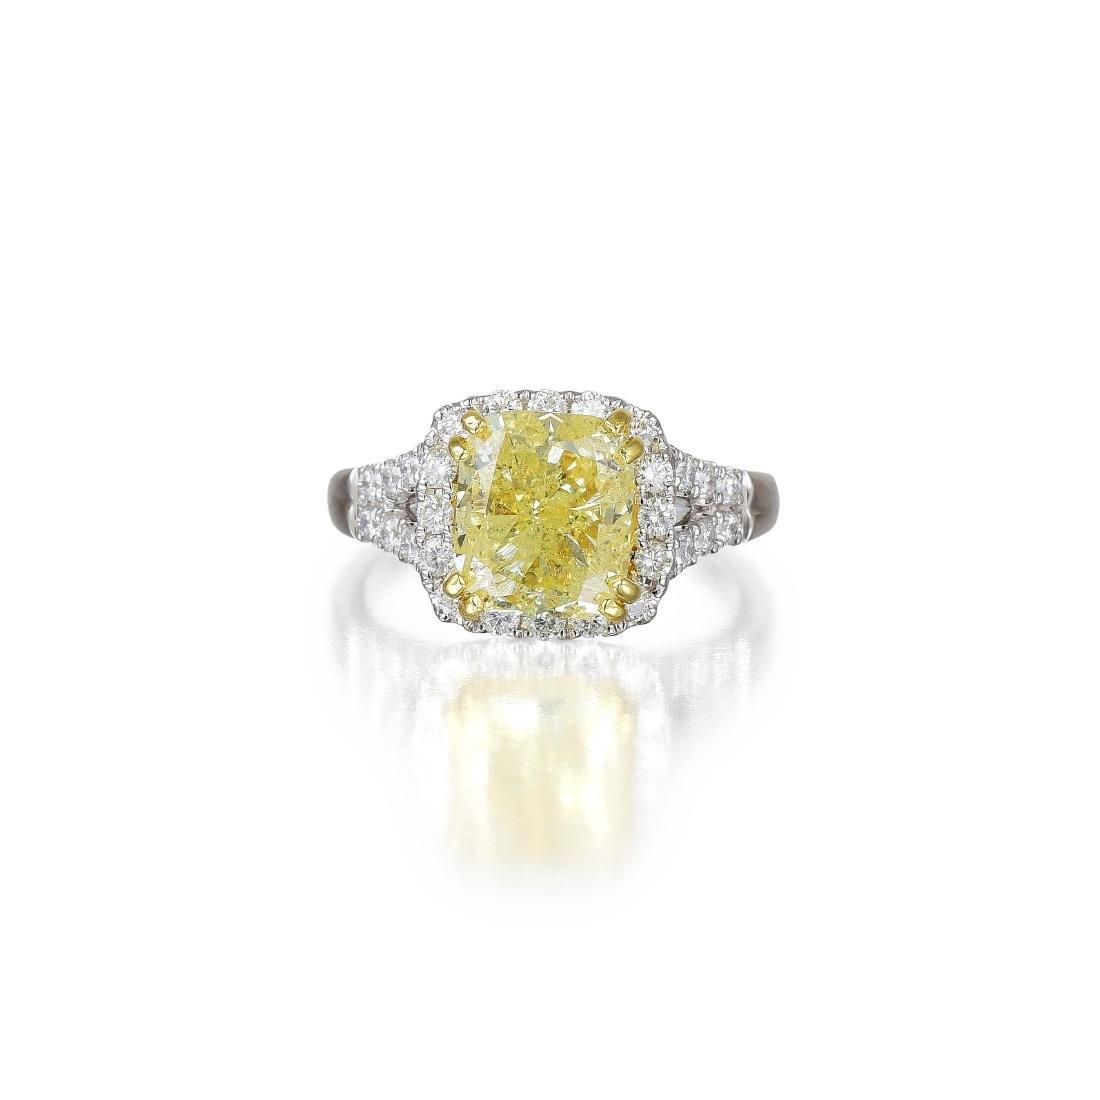 A 3.80-Carat Yellow Diamond Ring